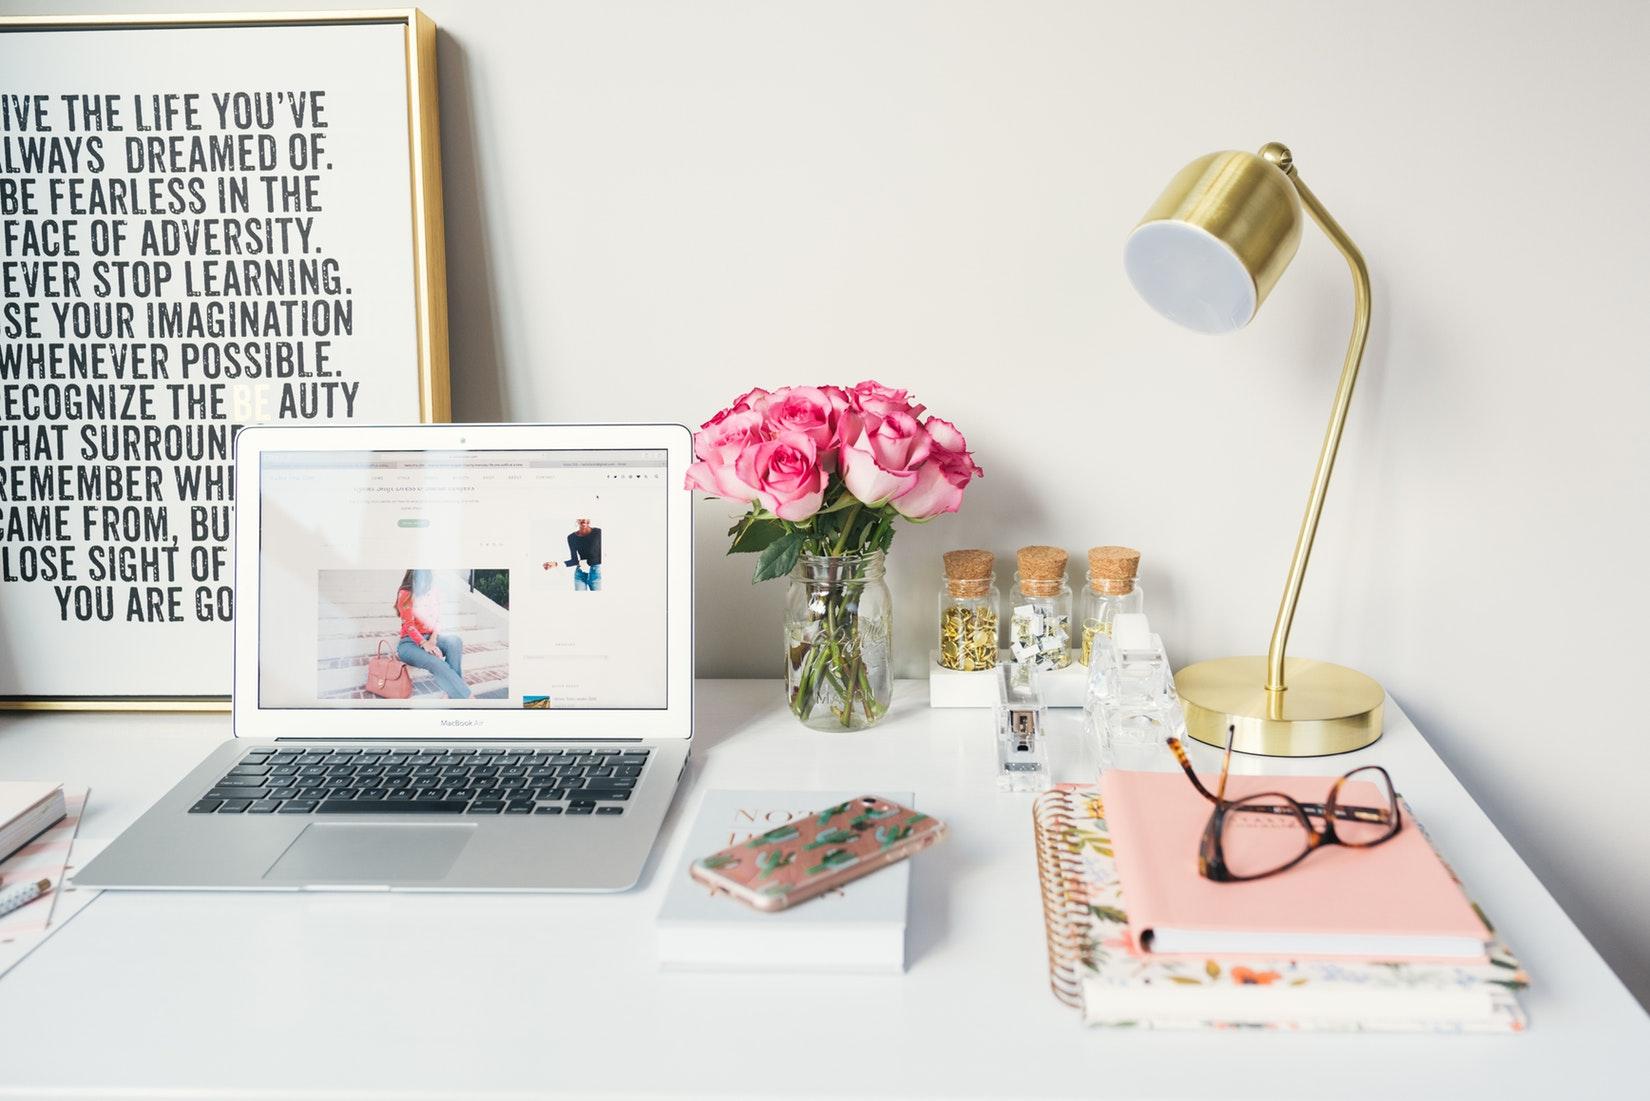 Essential-Oils-For-Work-Office-Lemon-Frankincense-Peppermint-Lemon-Orange-Joy-Stess-Away-Frankincense-Oola-Grow-Field-Motivation-Believe-Young-Living-The-Oily-Home-Companion.jpeg